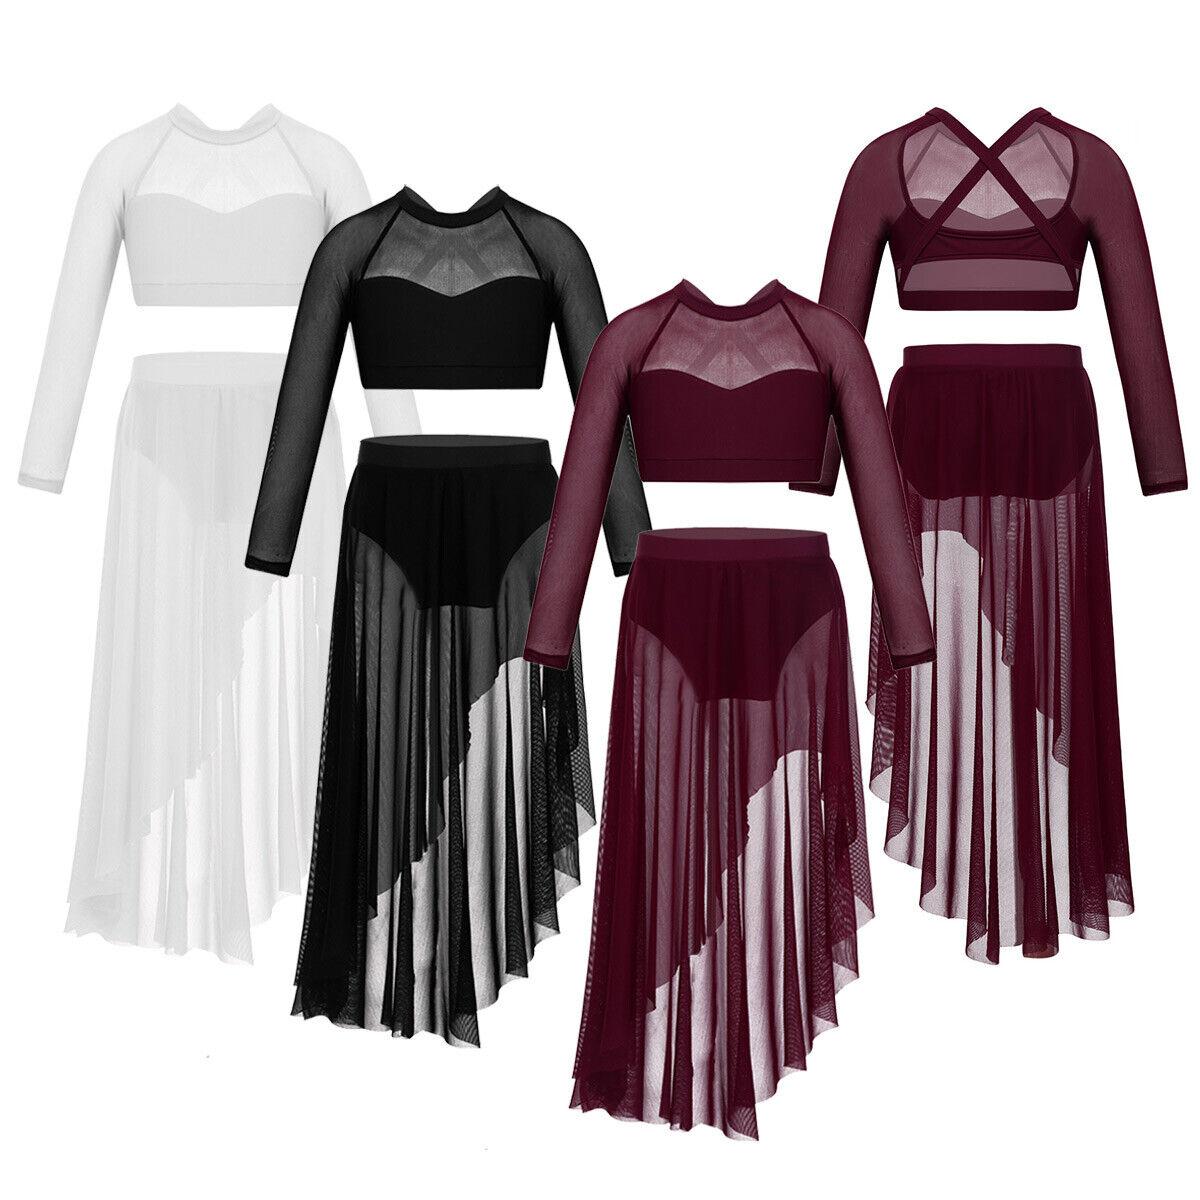 Kids Girls Lyrical Dance Dress Camisole Leotard Ballroom Dancing Outfits Costume